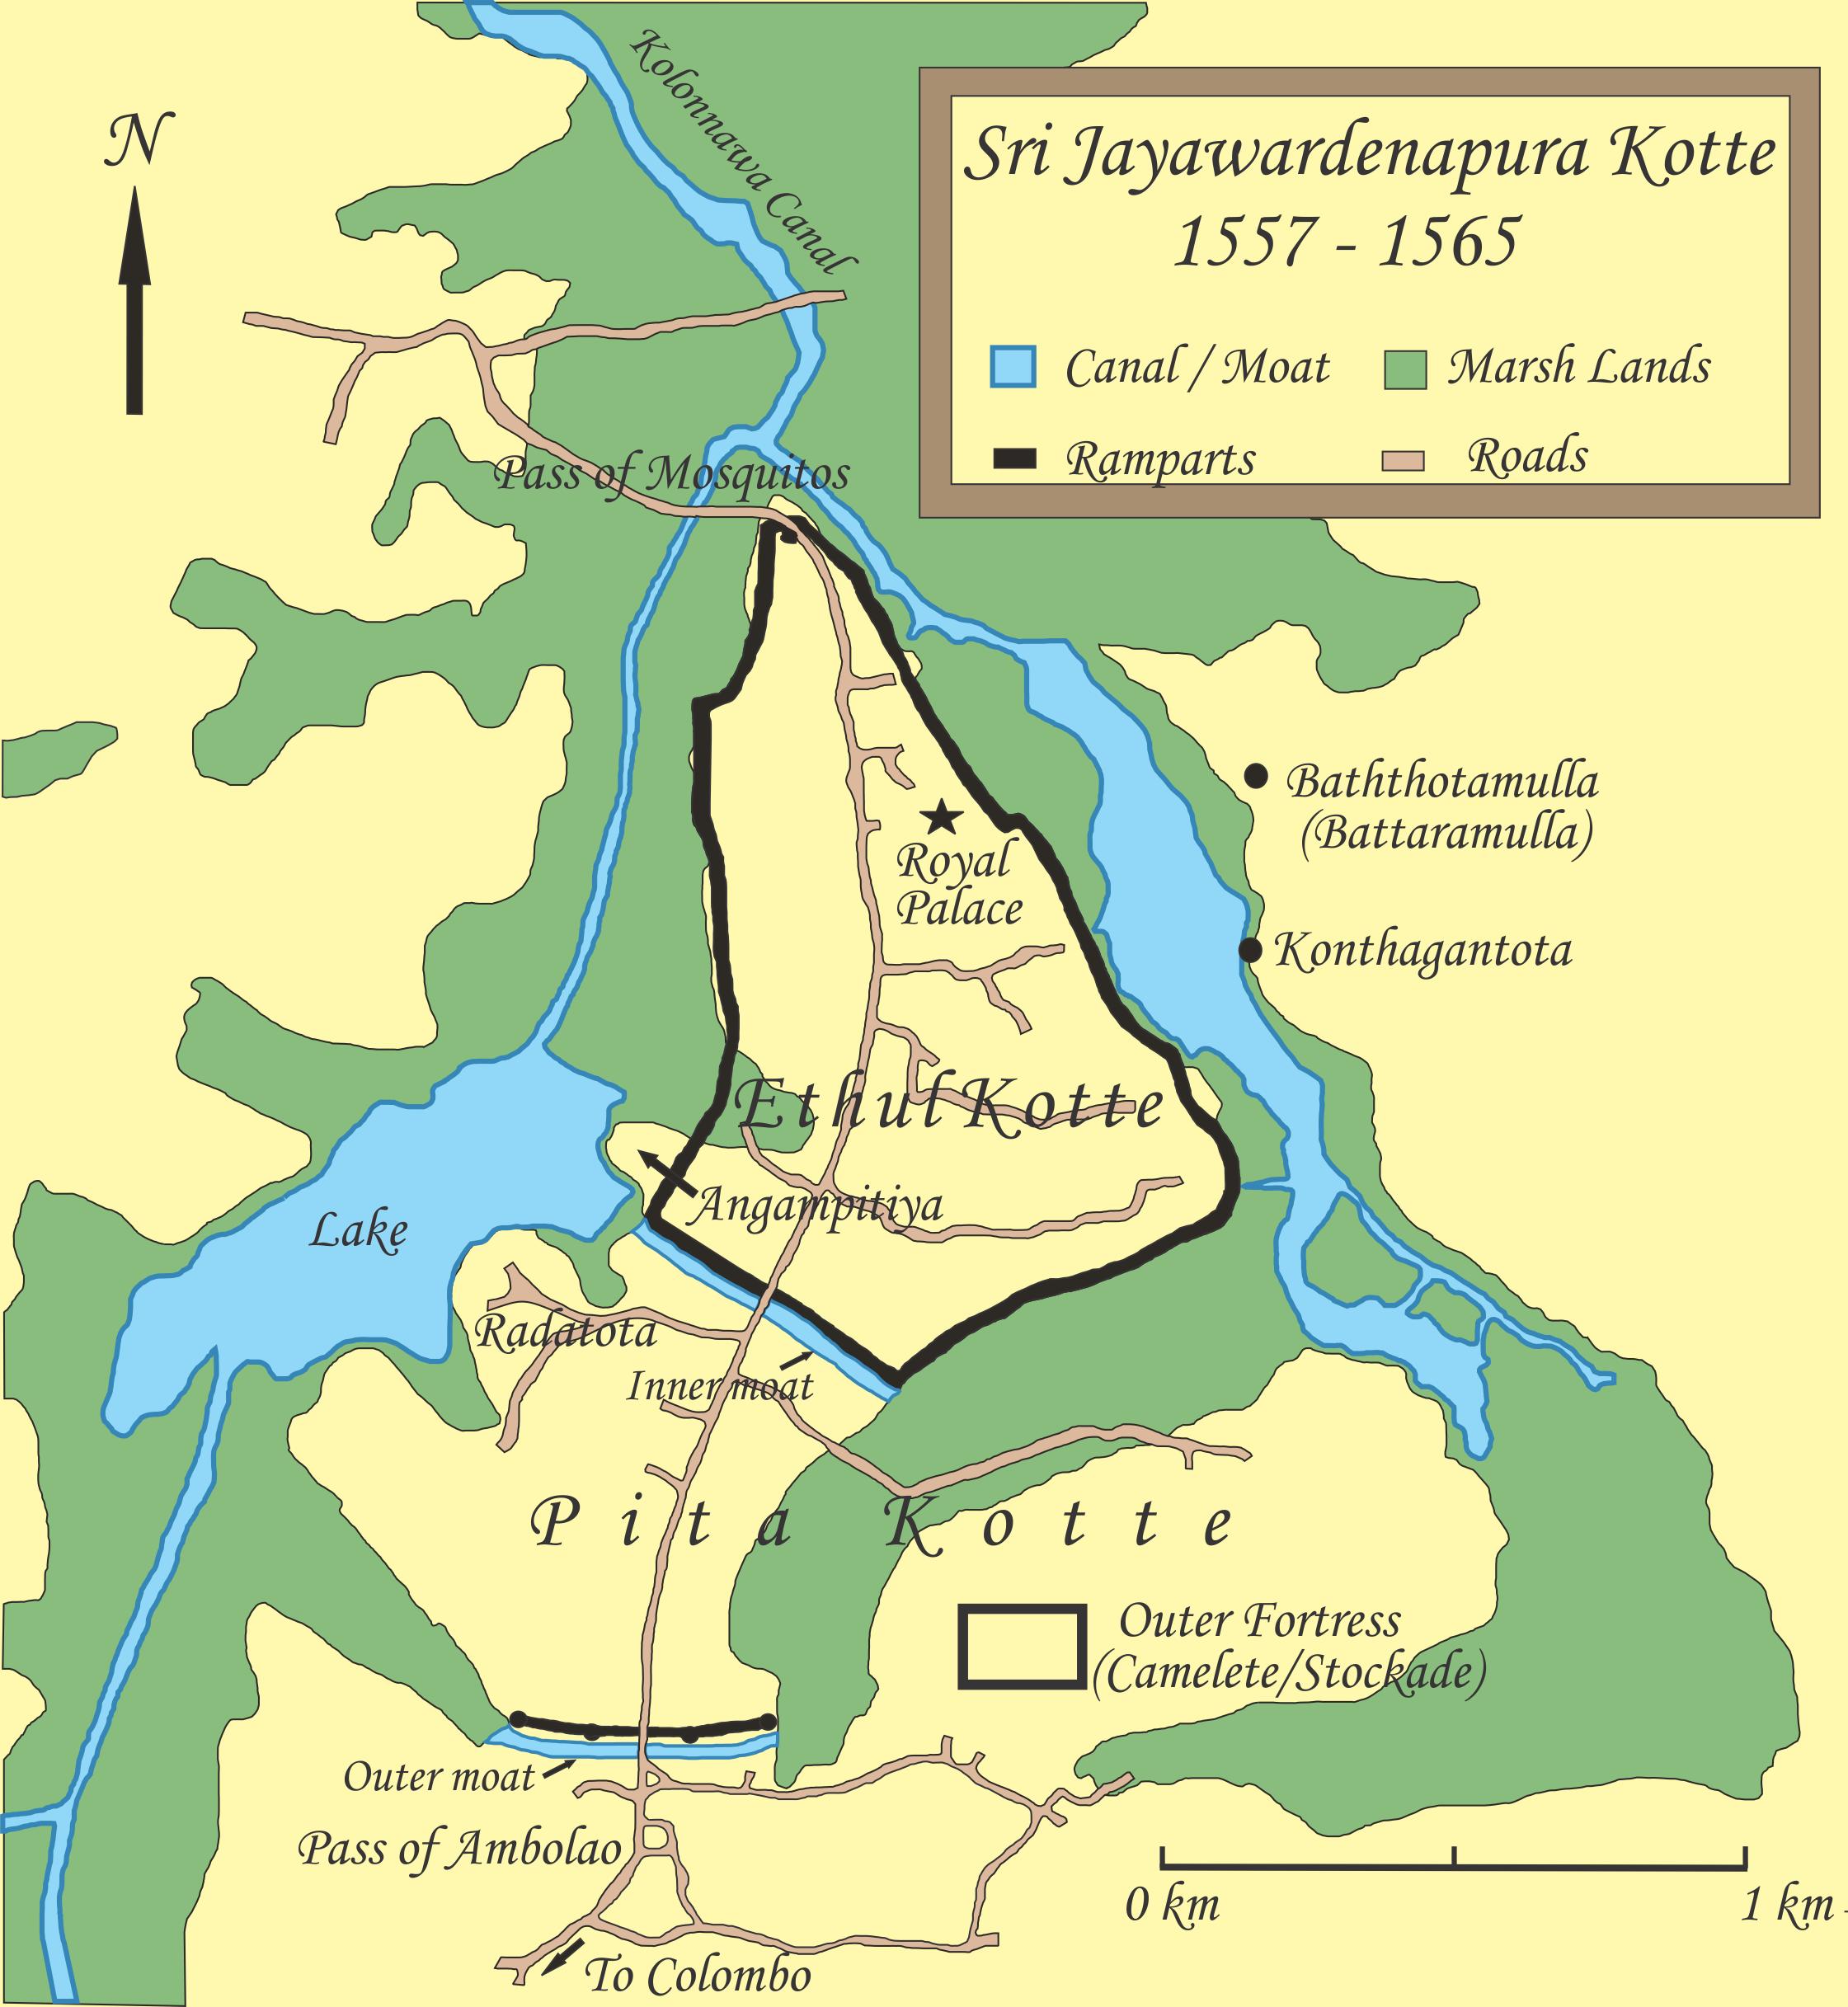 Sri Jayawardenapura-kotte Map | Maps